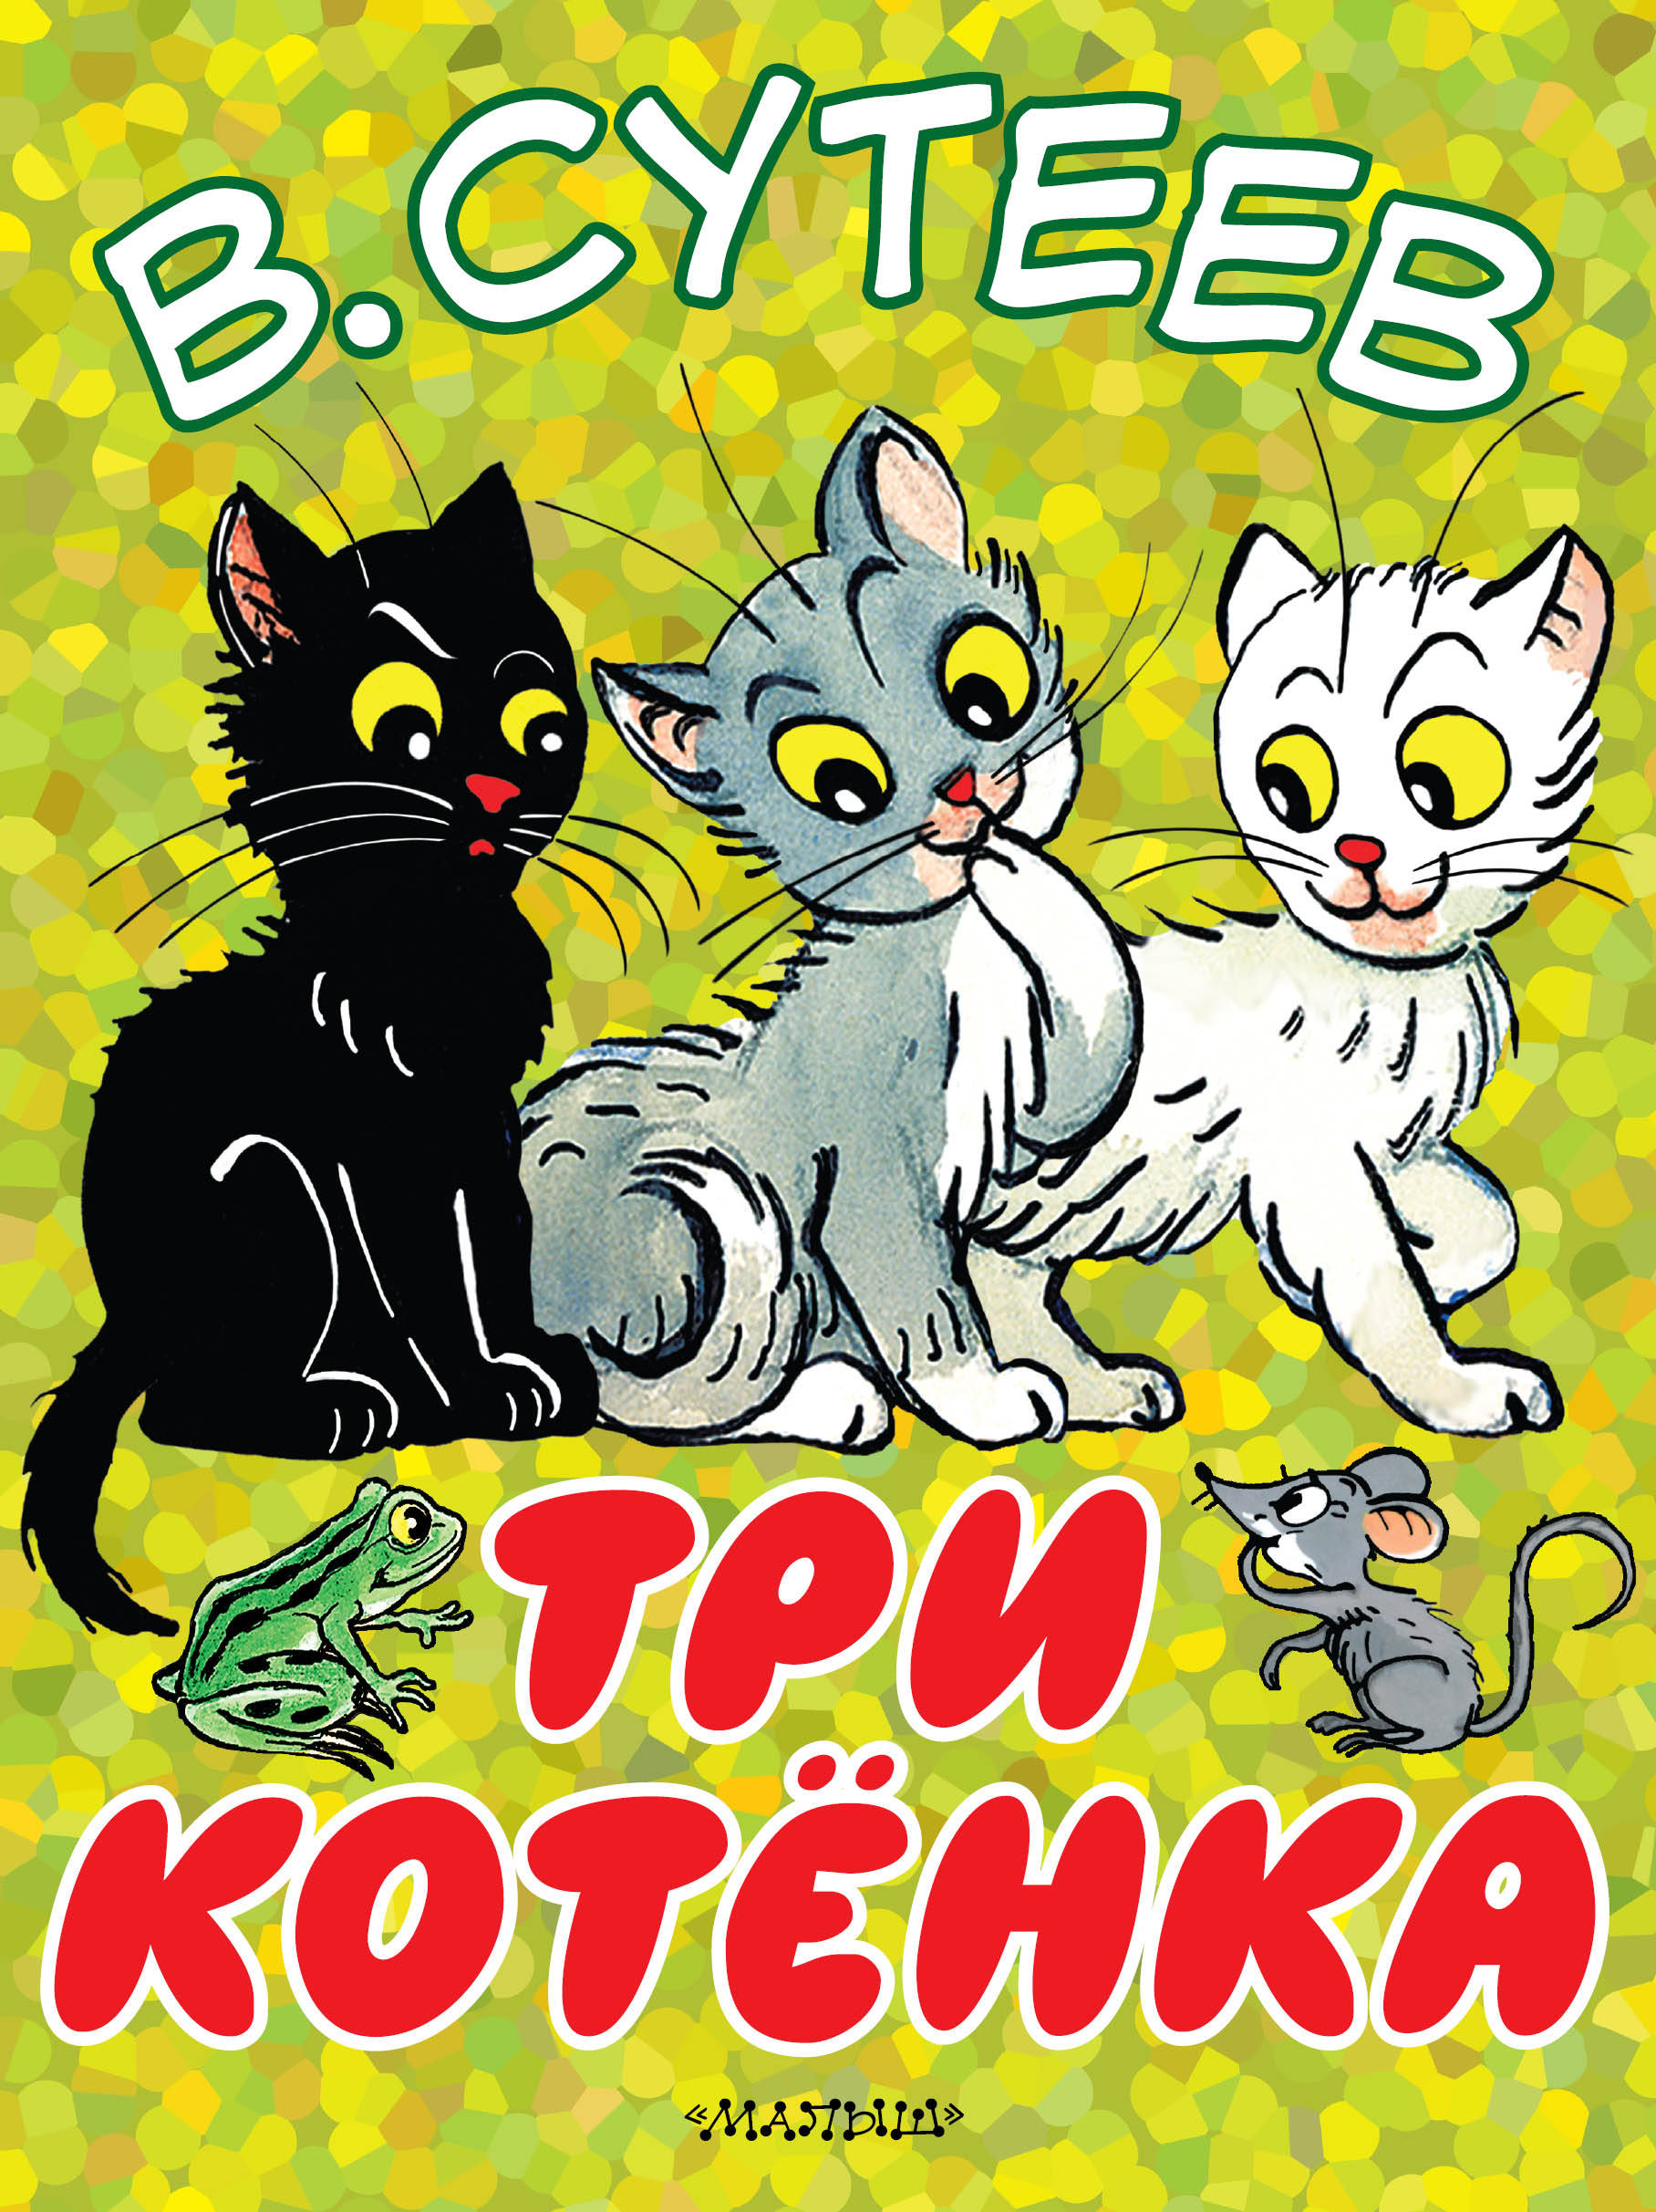 В. Сутеев Три котёнка сутеев владимир григорьевич три котёнка isbn 978 5 17 100500 9